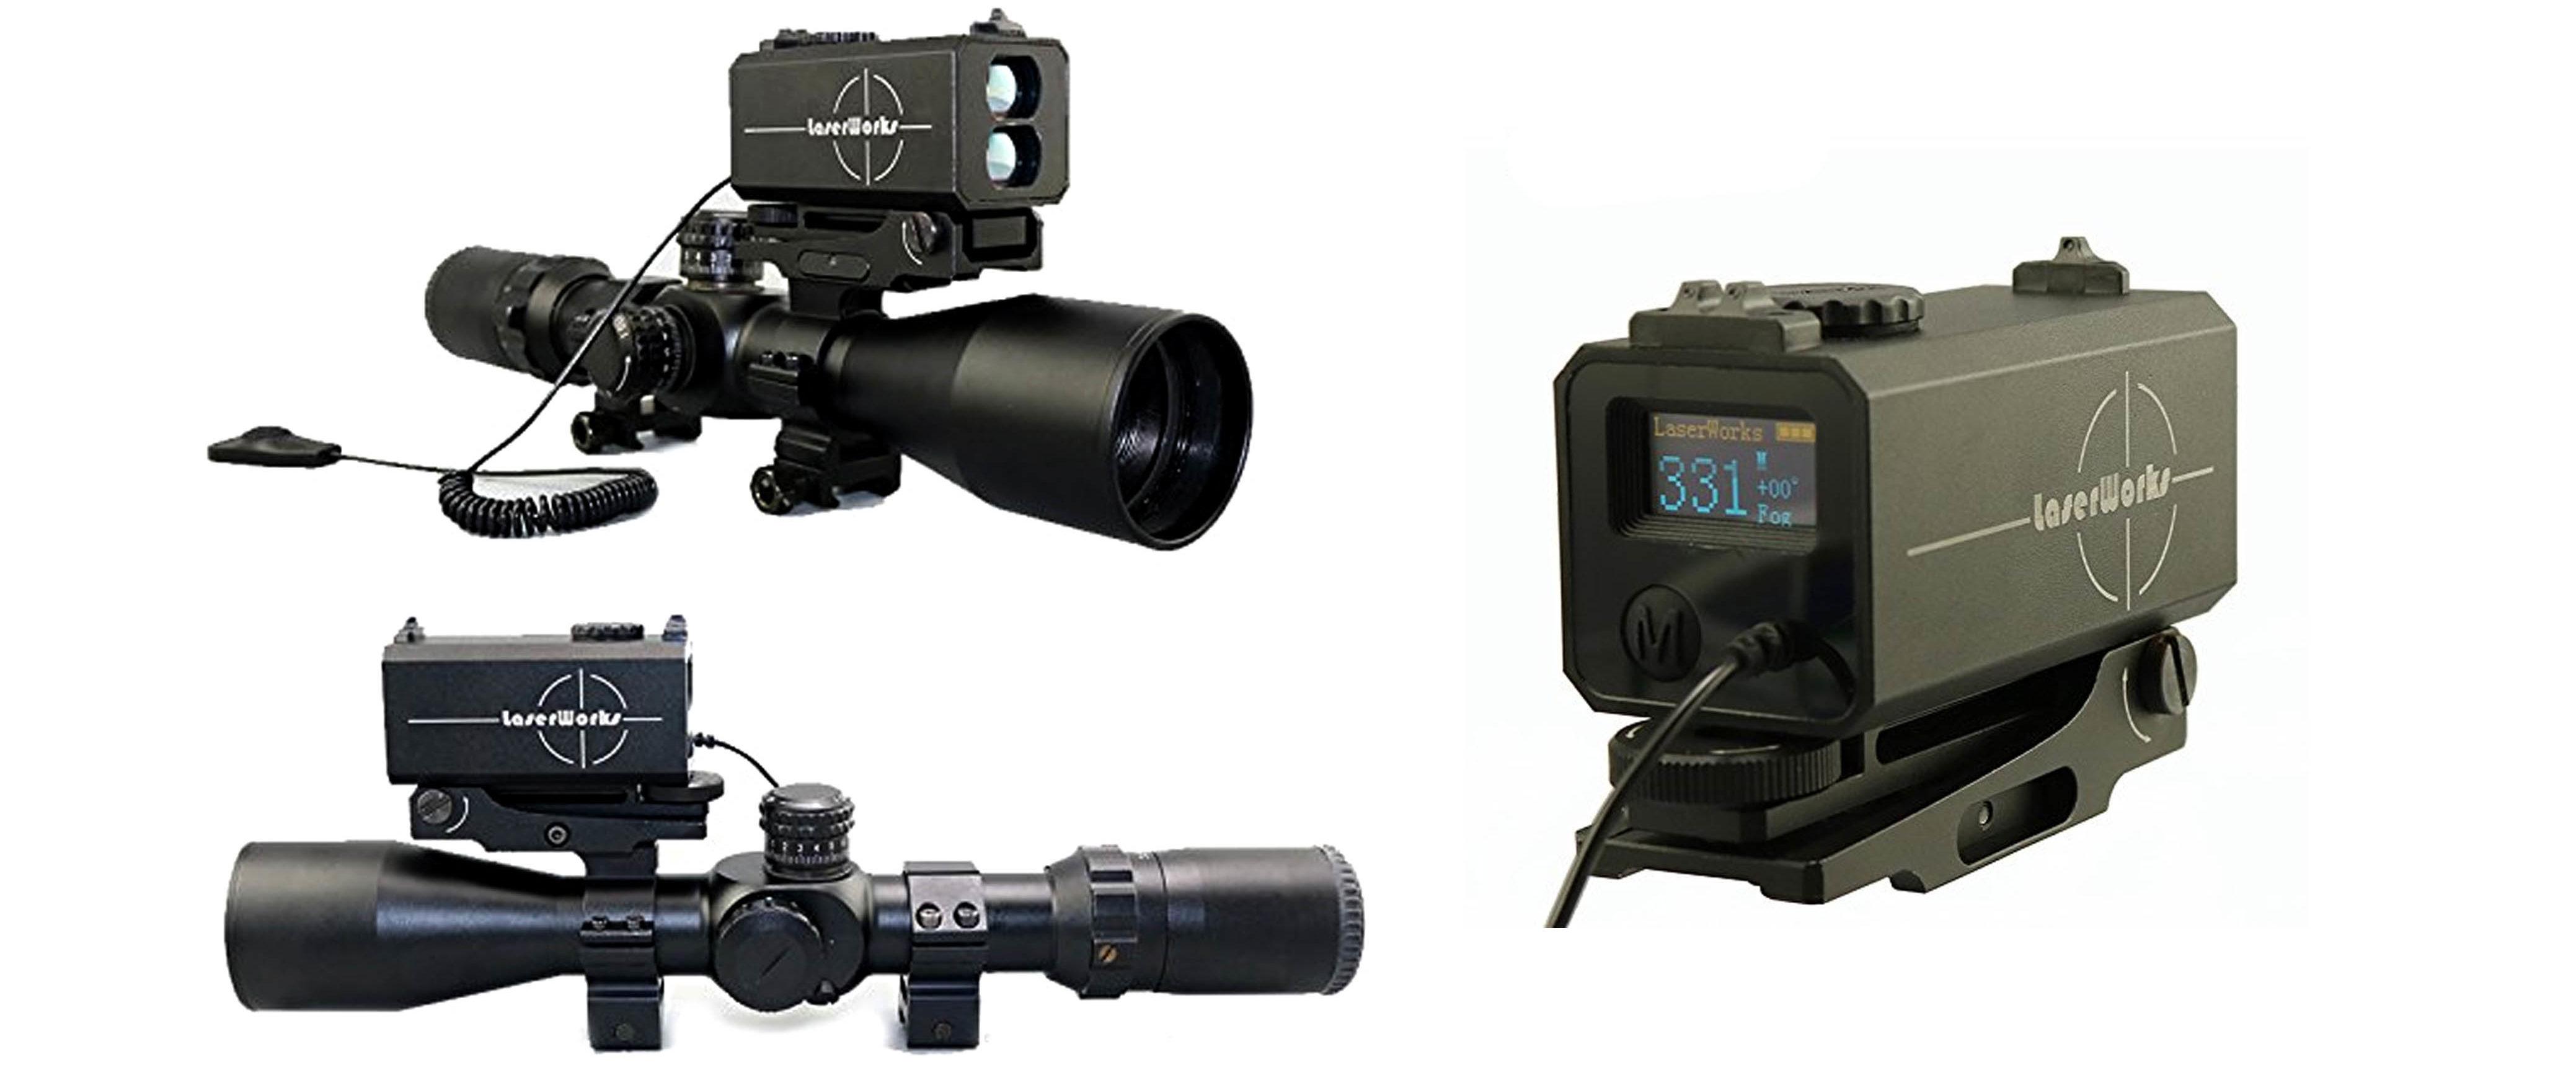 LaserWorks LE-032 Riflescope mate rangefinder 700M